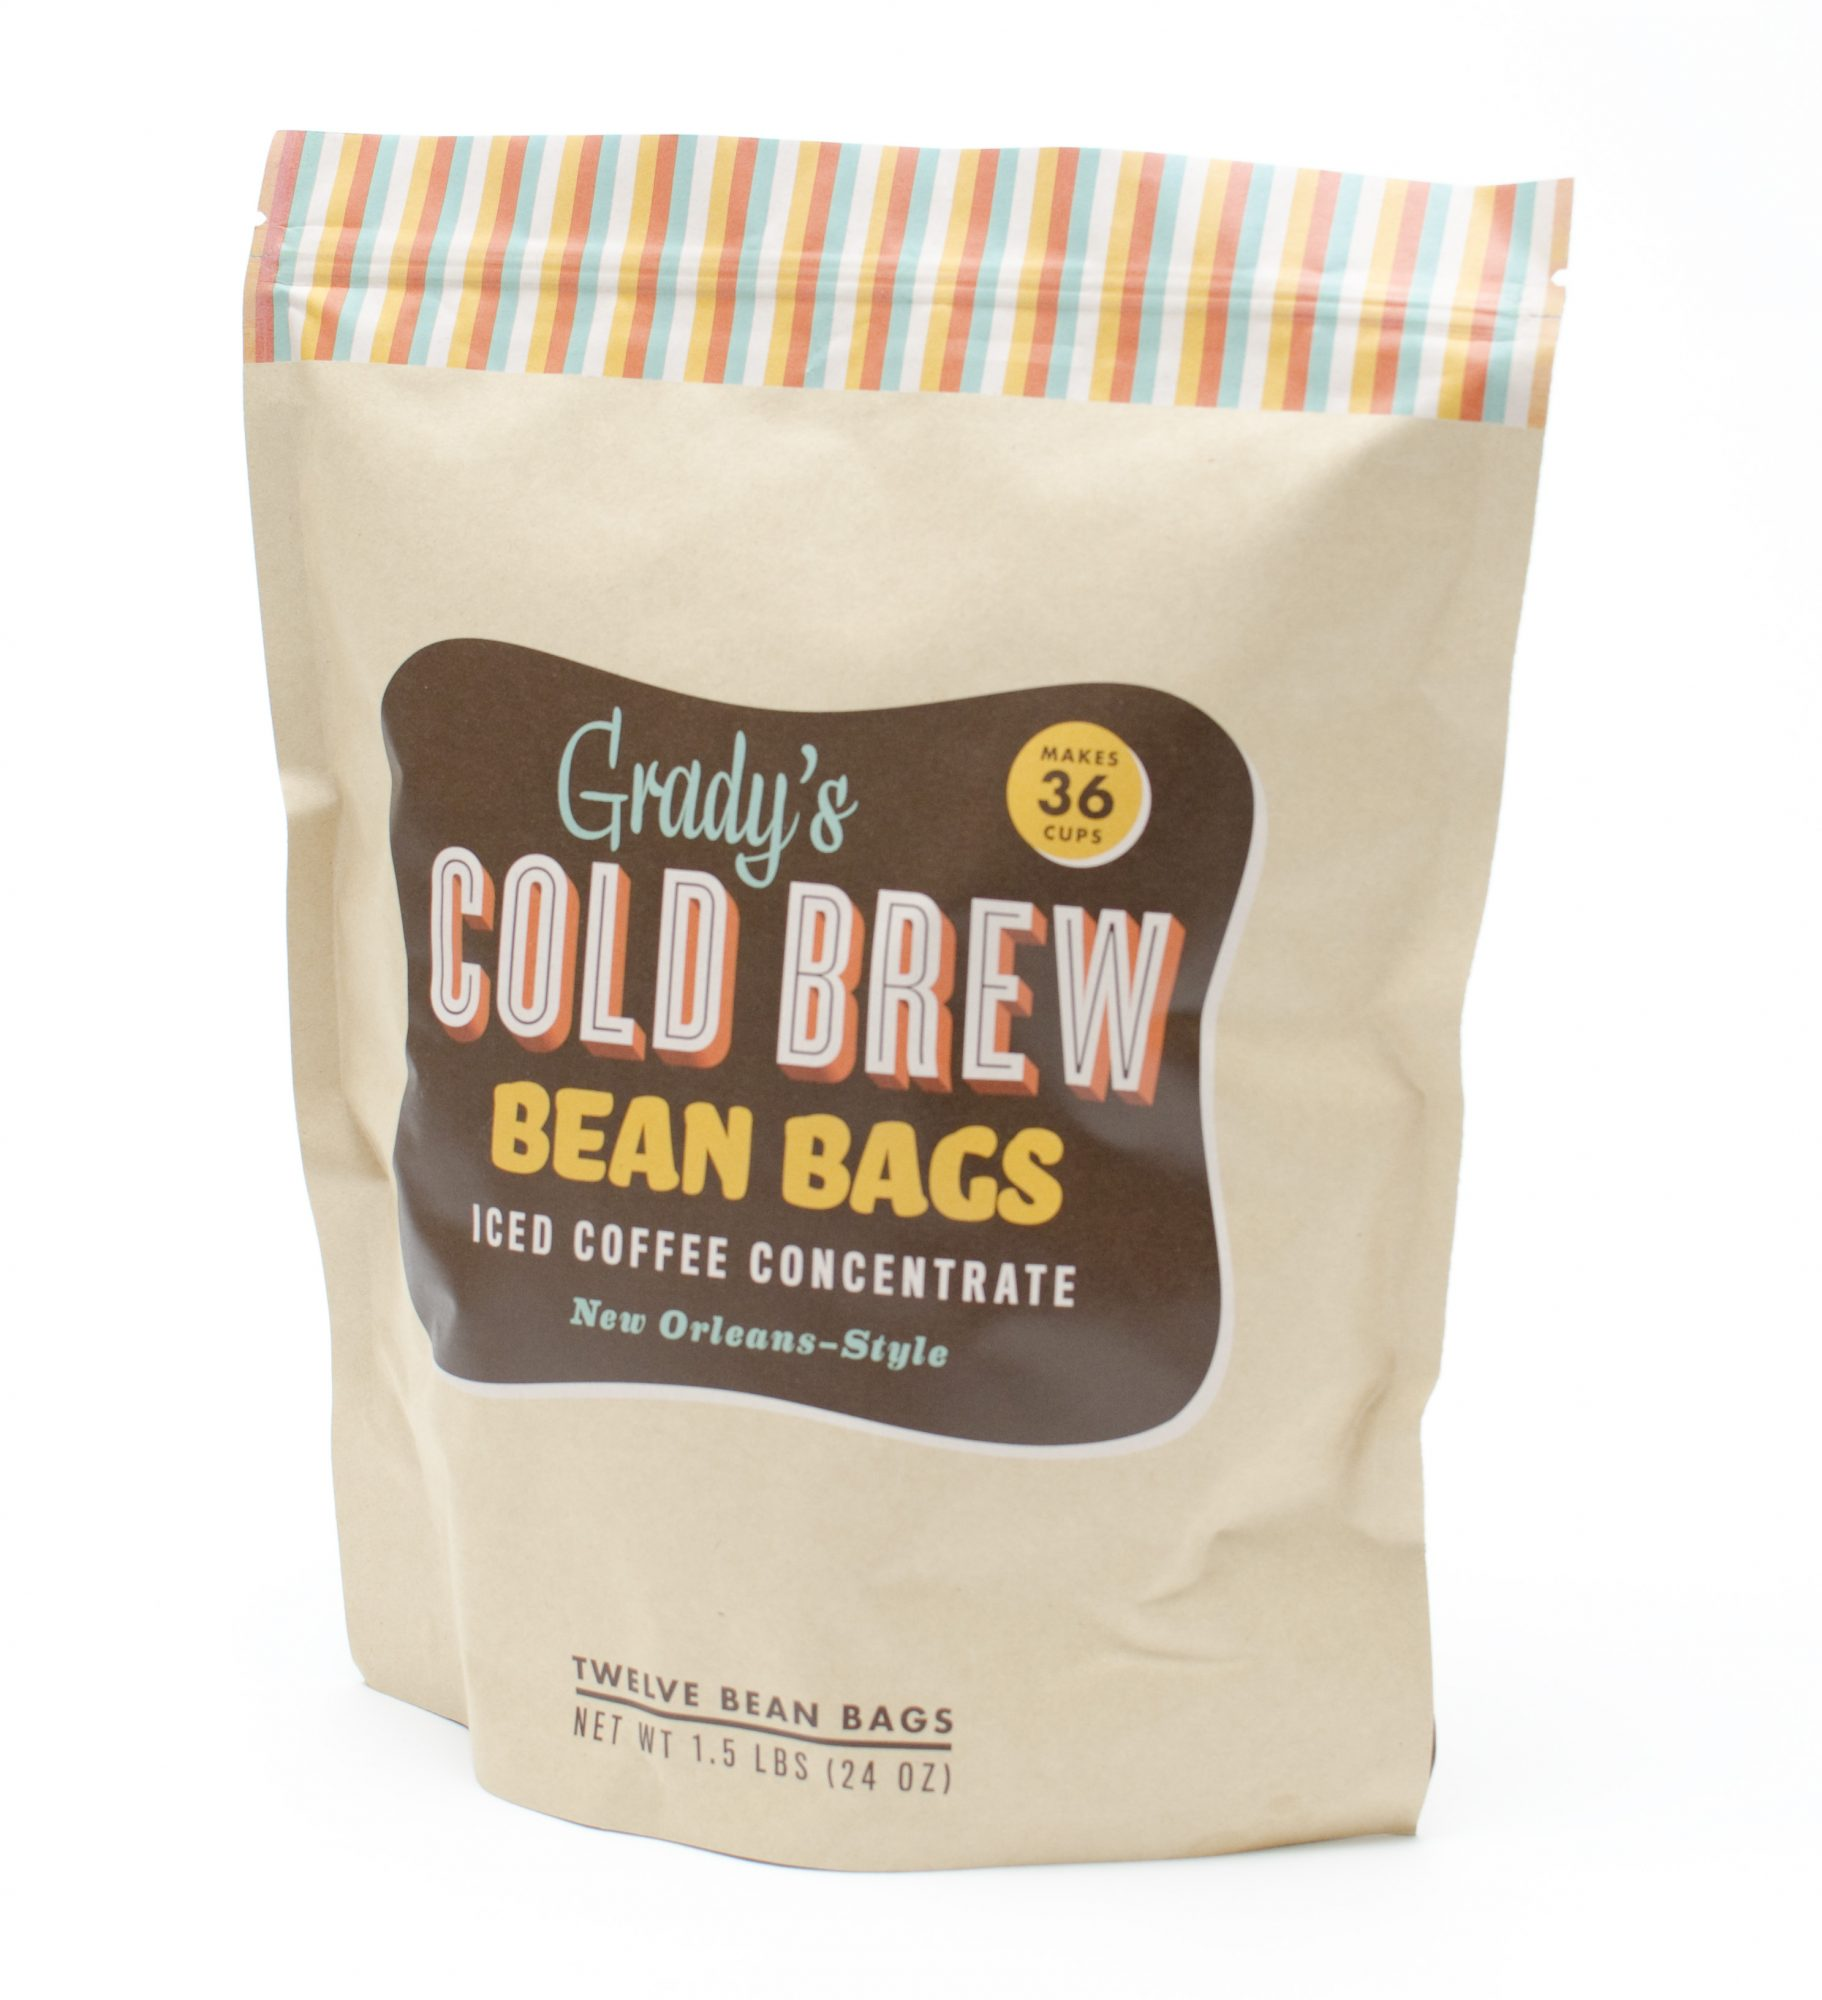 Grady's Cold Brew Coffee